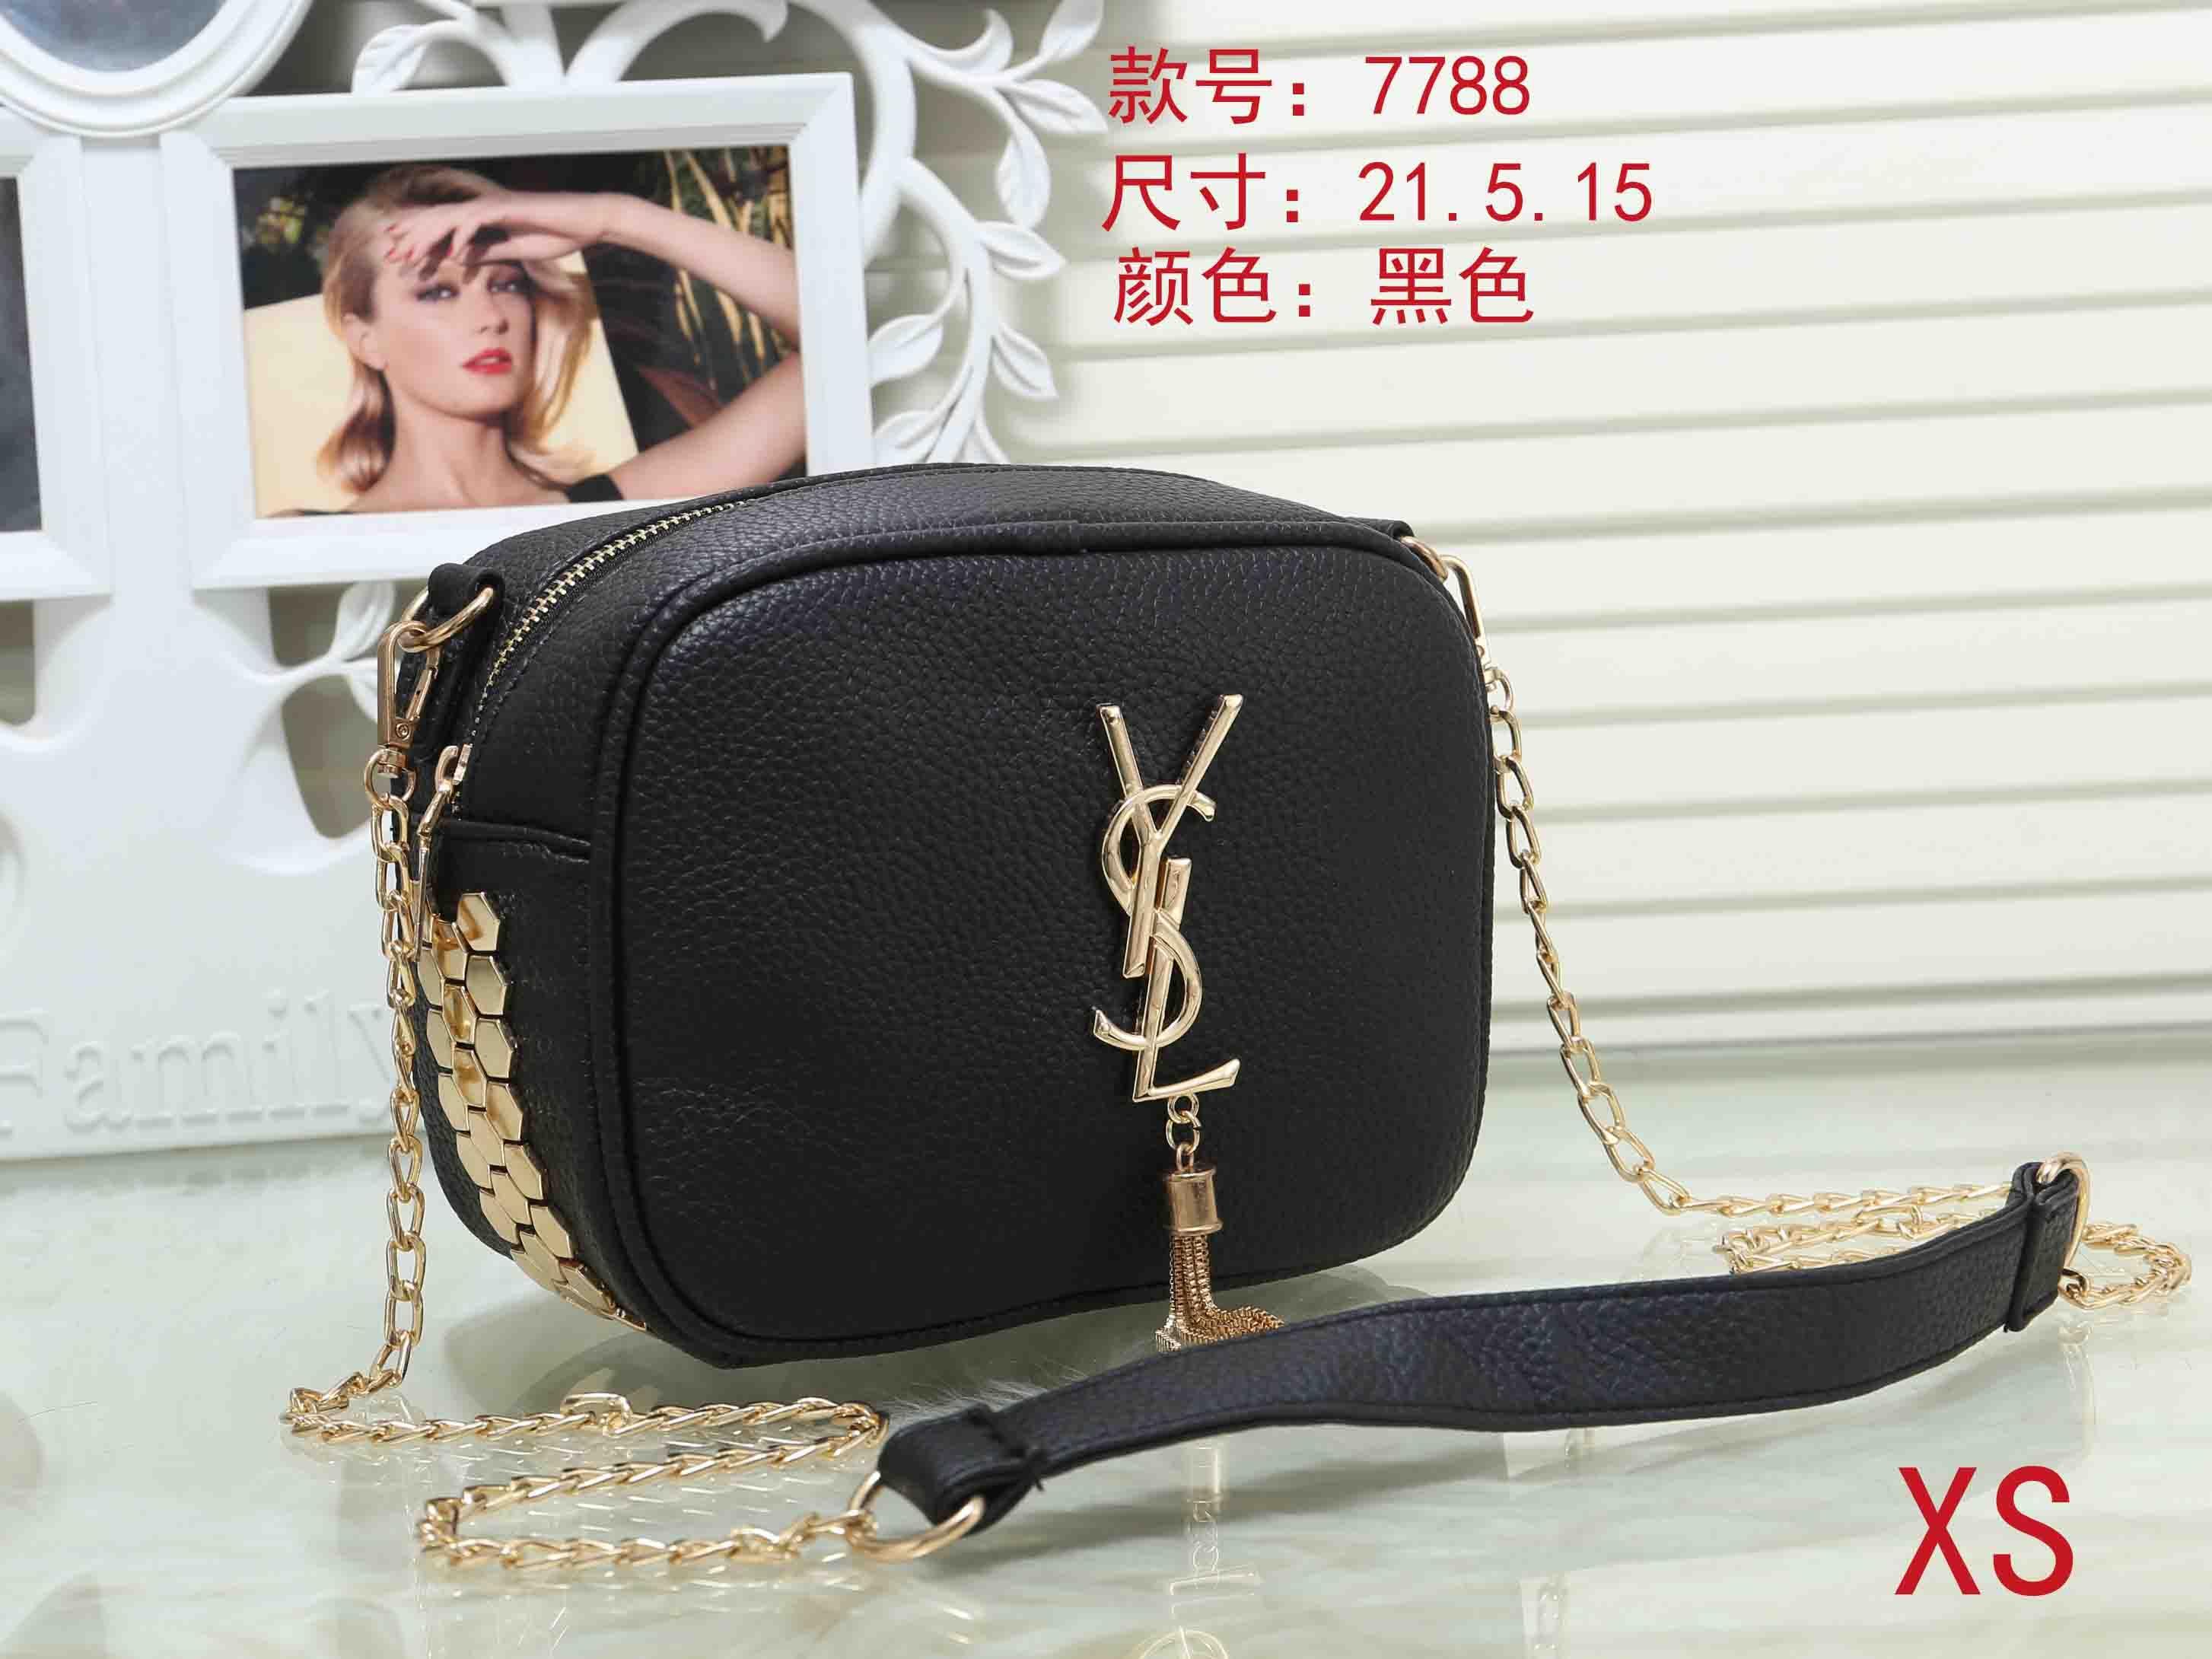 The most Fashion Bags Ladies handbags designer bags women tote bag luxury  brands bags Single shoulder bag Drop shipping wallets purse tag 94